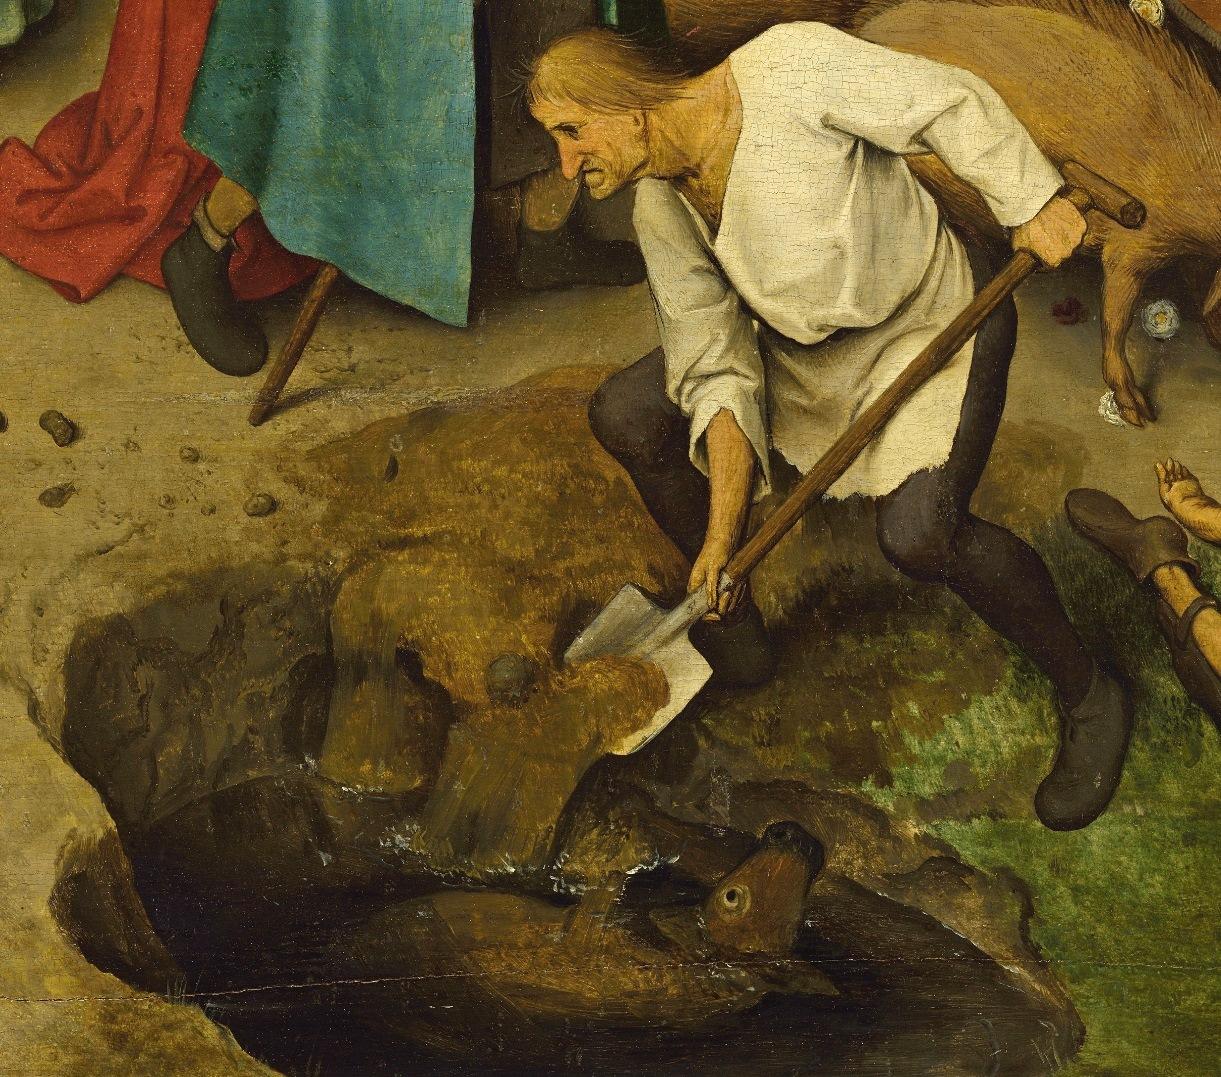 brueghel-proverbs-041.jpg